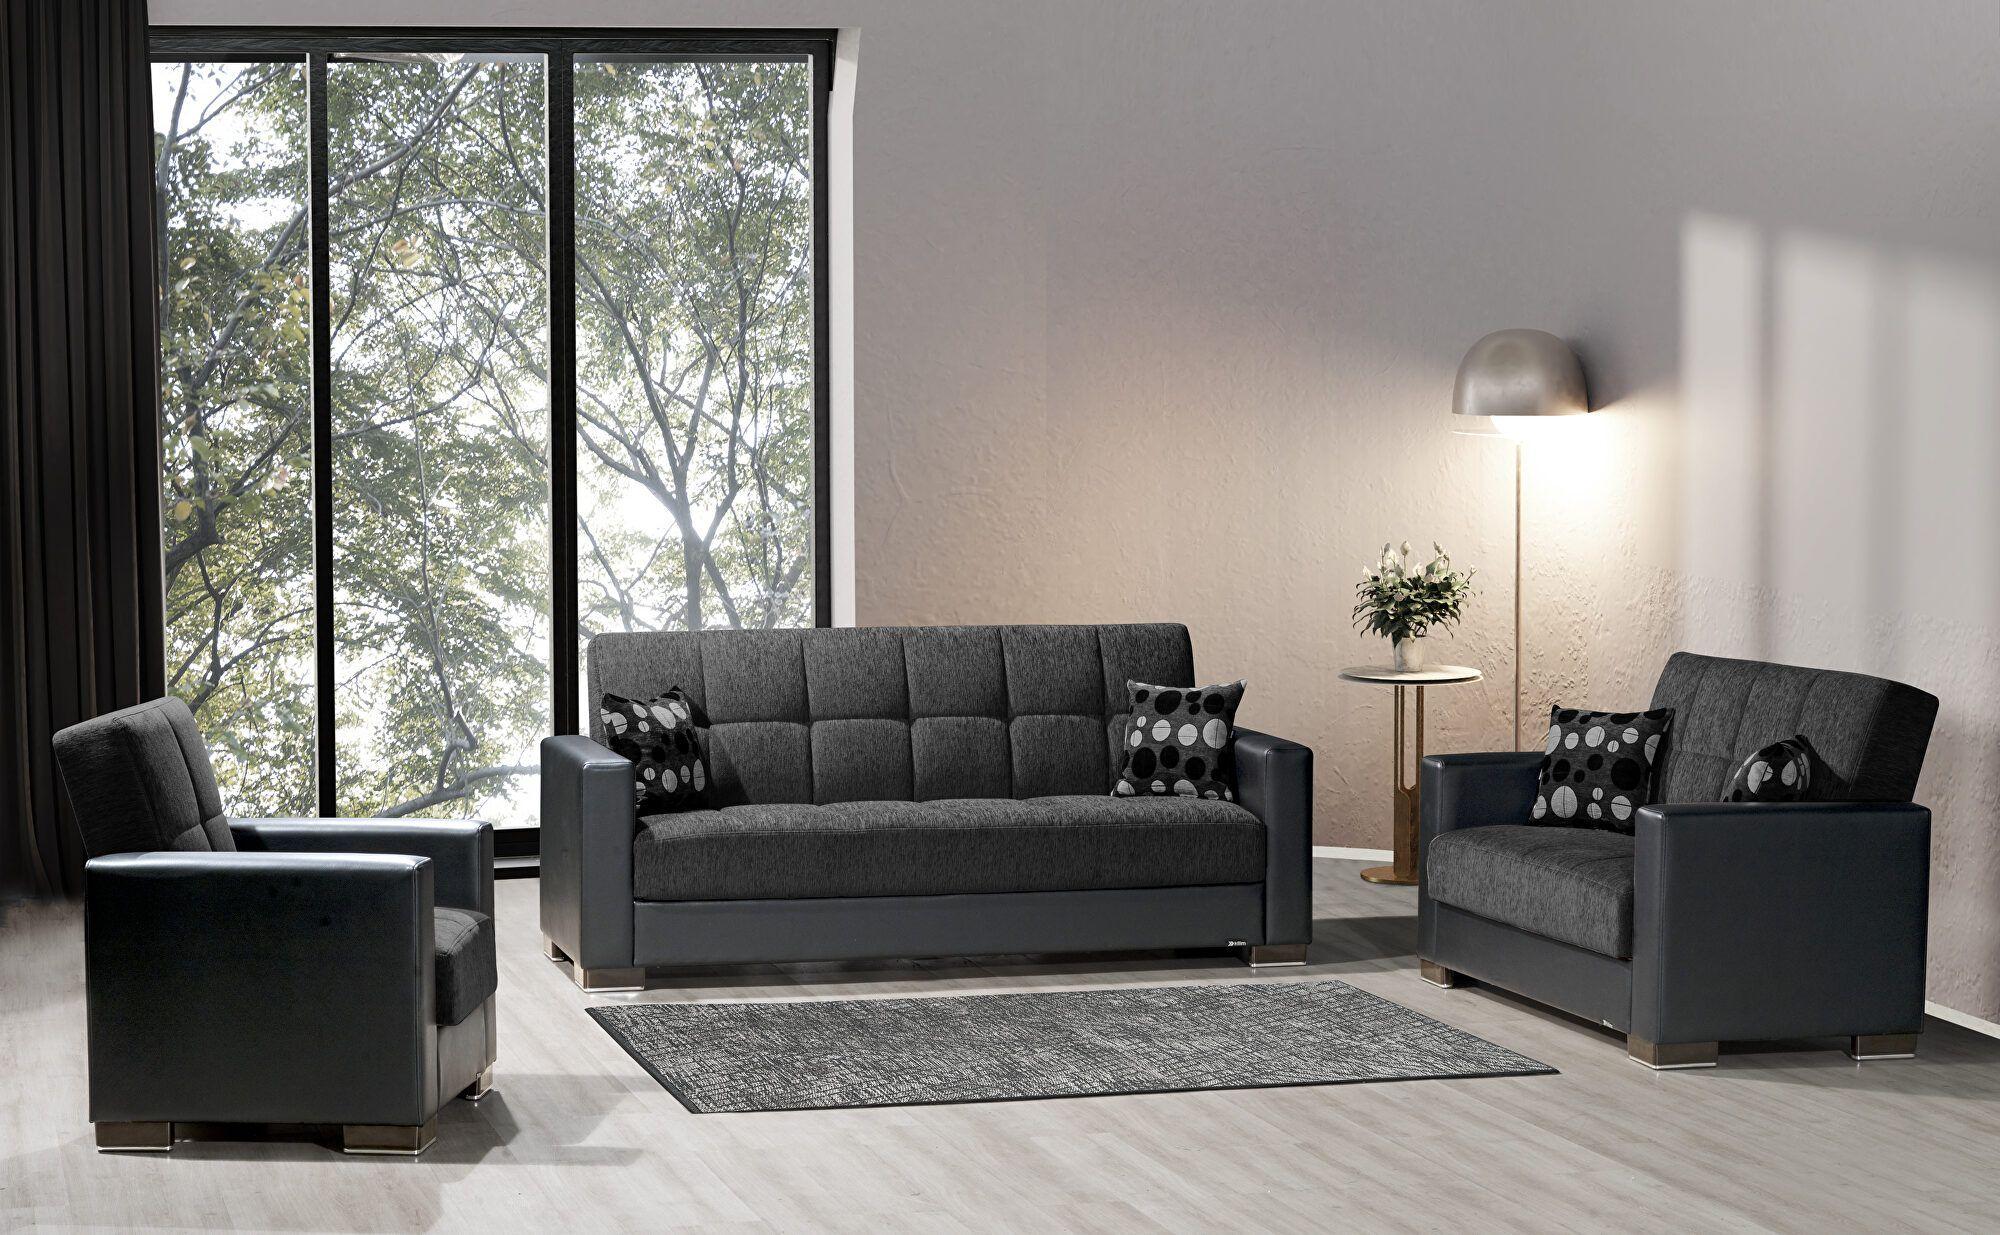 Armada Asphalt Black Sofa 18 Casamode Furniture Fabric Sofas In 2021 Sofa Bed With Storage Fabric Sofa Furniture Fabric